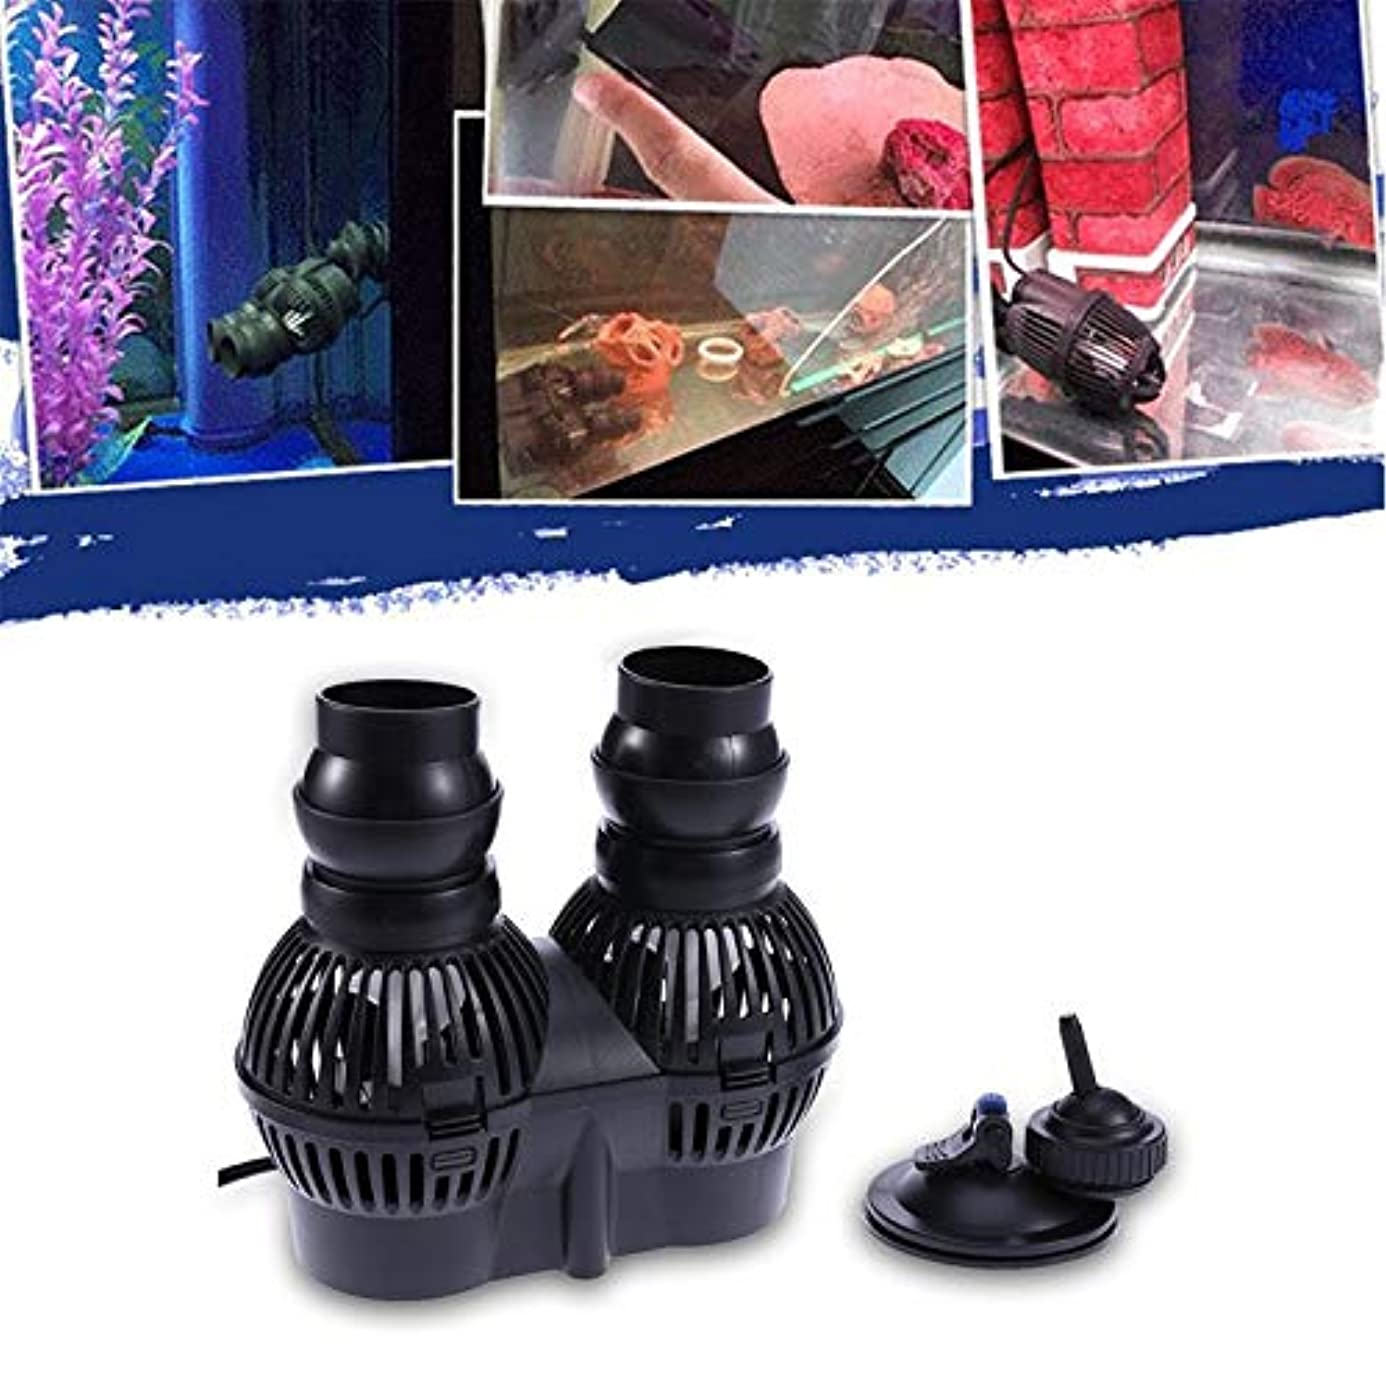 Ants-Store - 2.5W/3W/12W/24W Circulation Pump Wave Maker Aquarium Reef Powerhead JVP-110/100A/201A/202A Sucker Suction Wave Pump